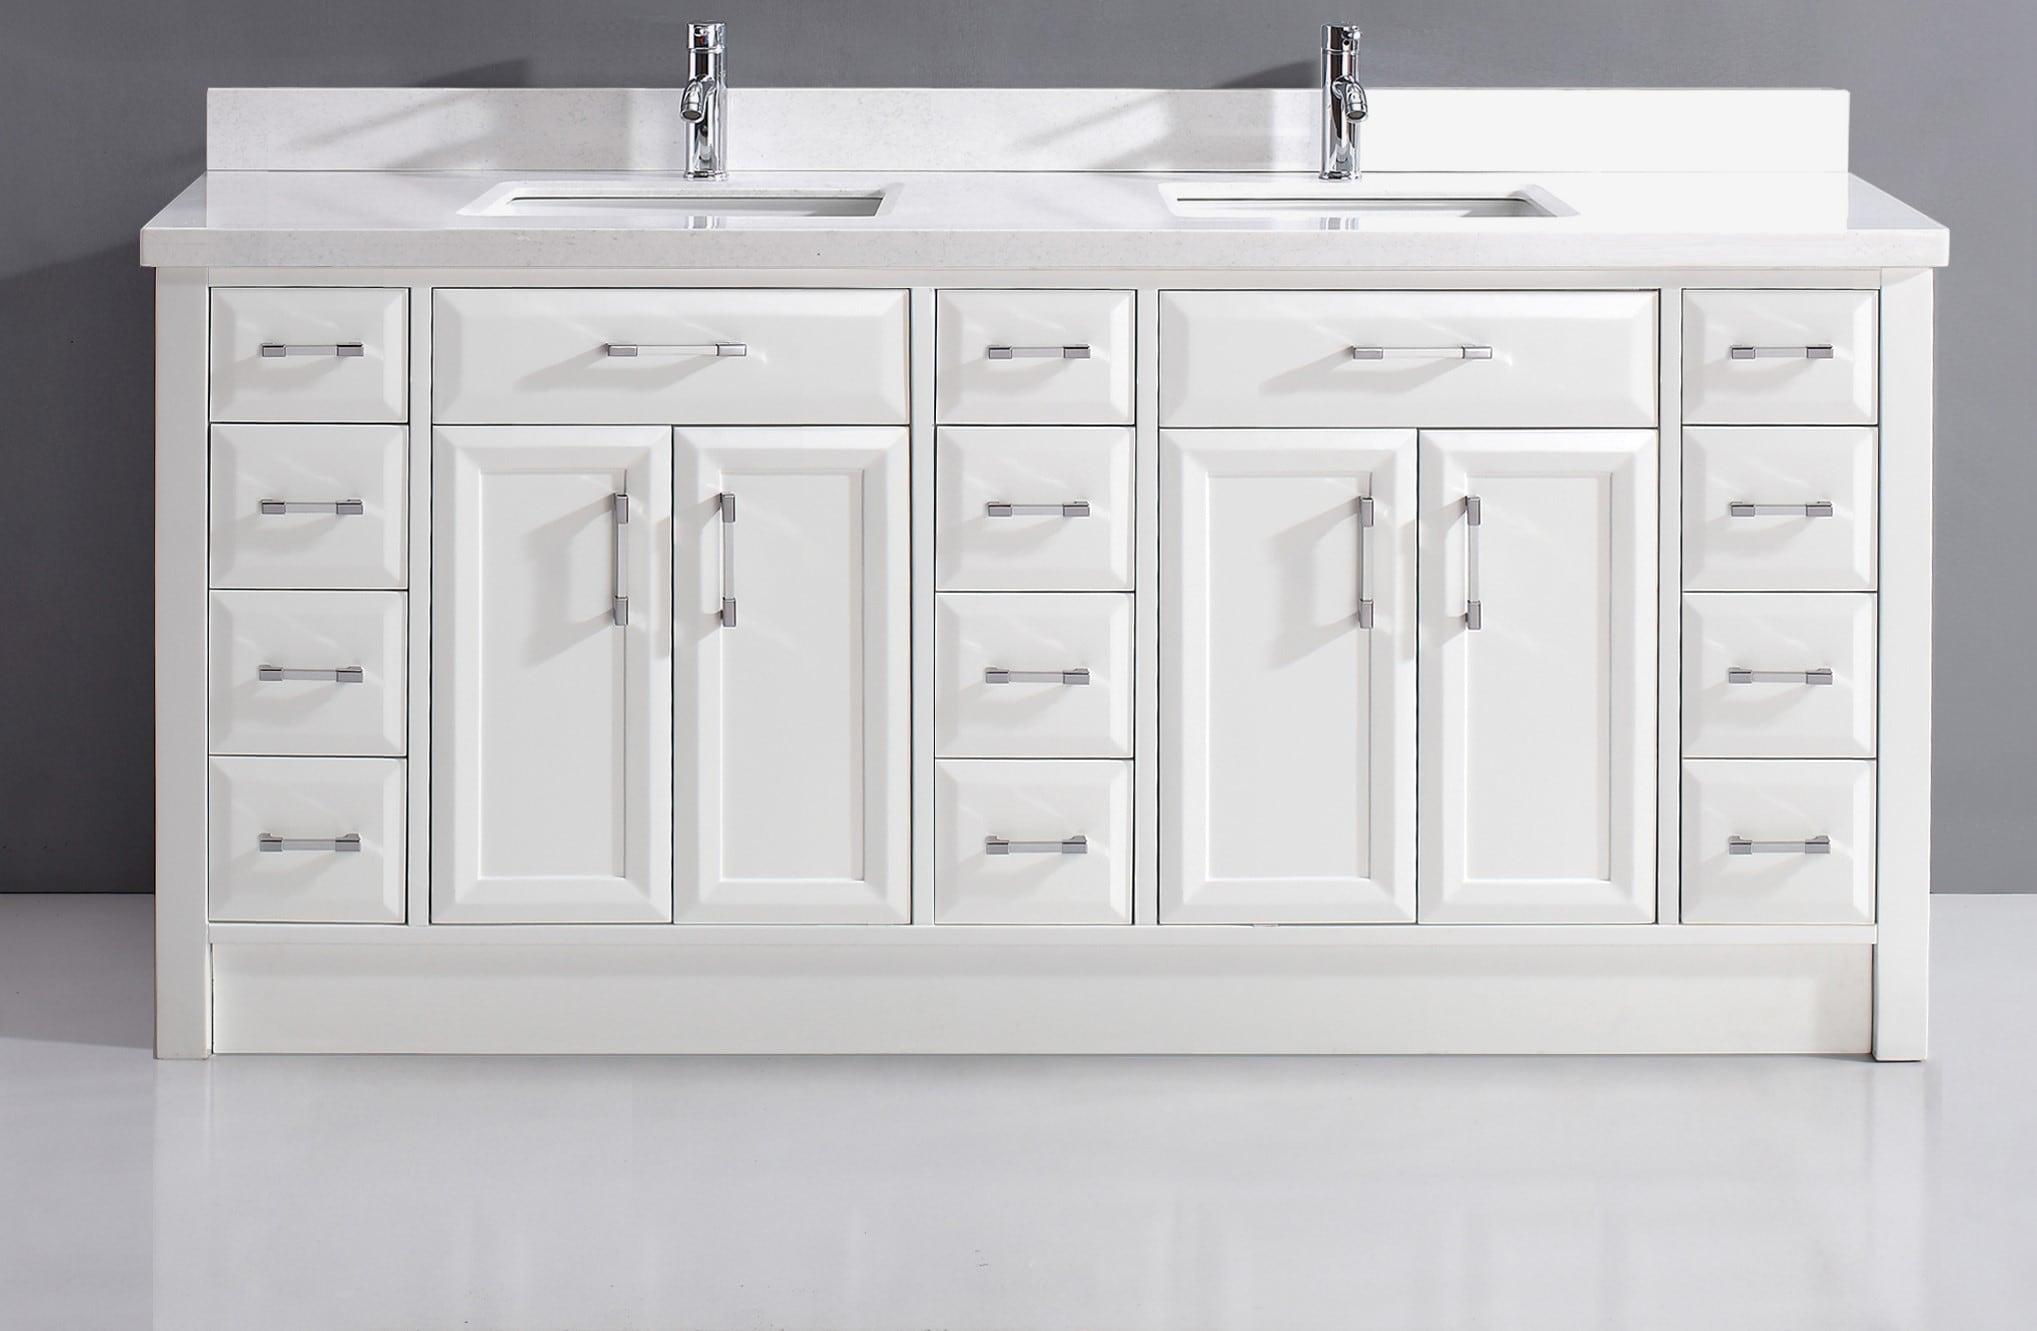 Spa Bathe Calumet 20 in White Undermount Double Sink Bathroom Vanity with  White with Grey Veins Engineered Stone Top